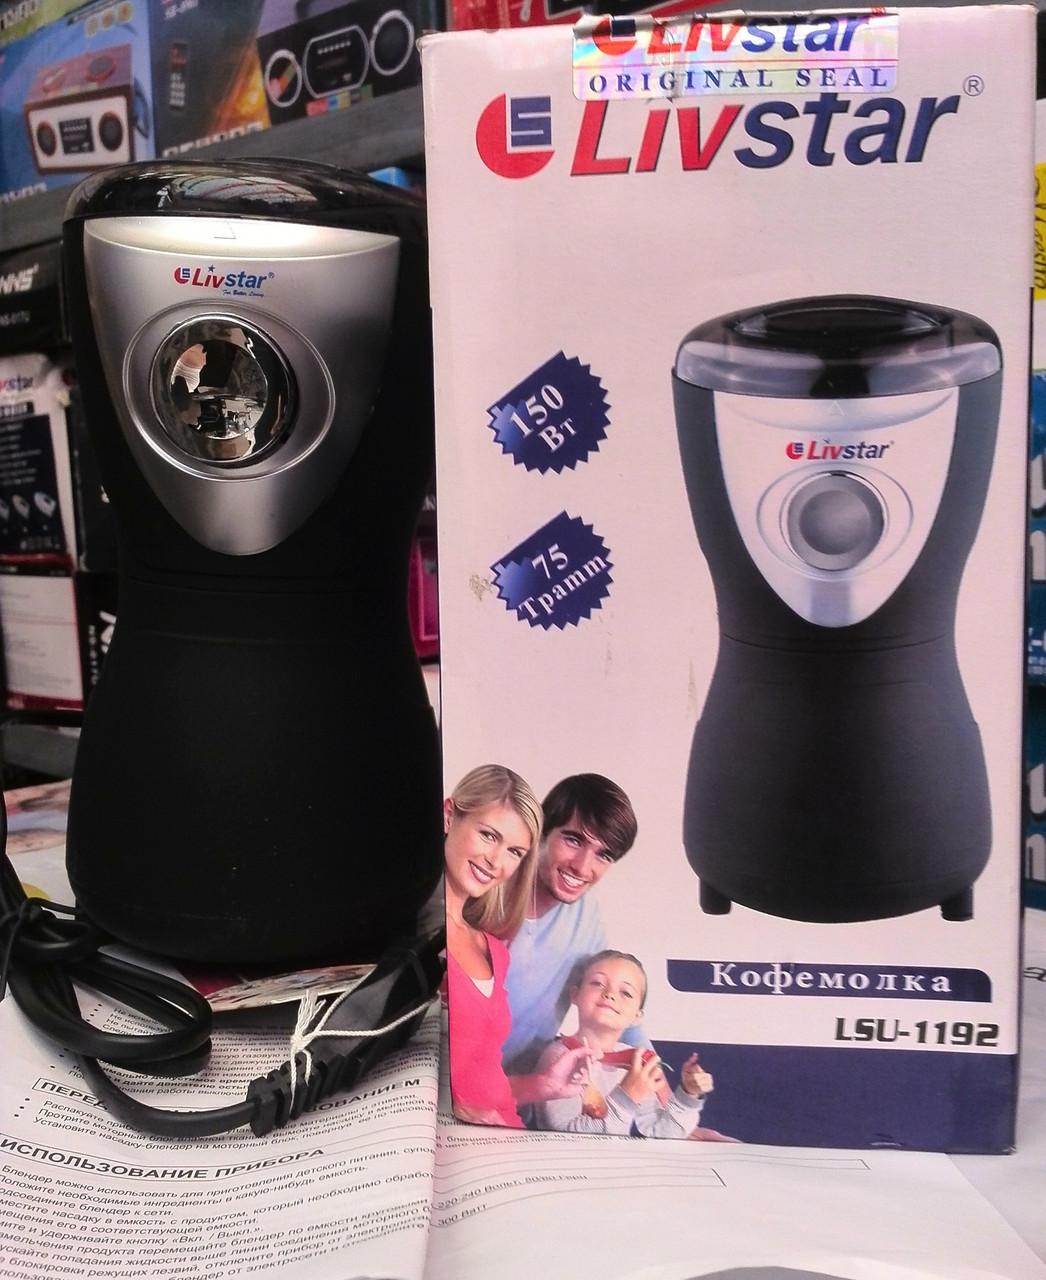 Кофемолка LIVSTAR LSU-1192, 75 Грамм, 130 Ватт